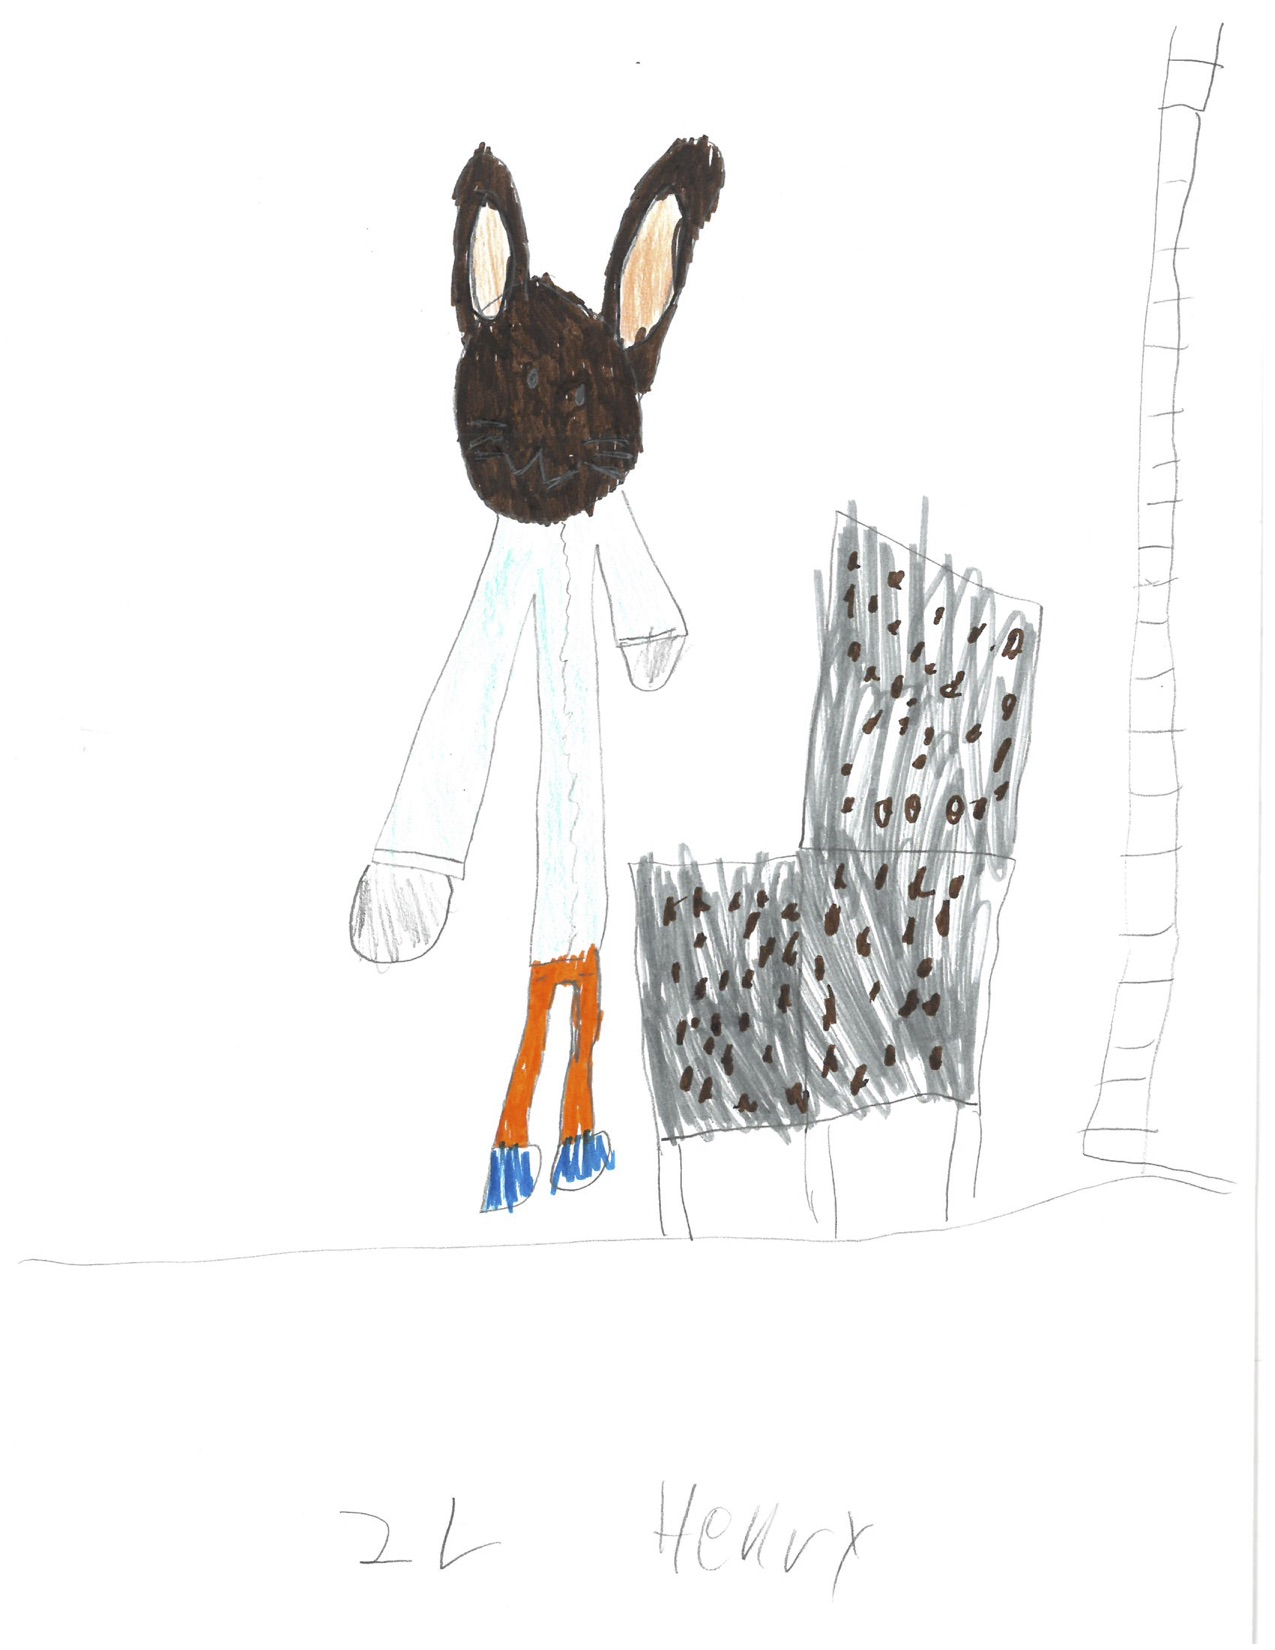 By Henry, 2nd Grade